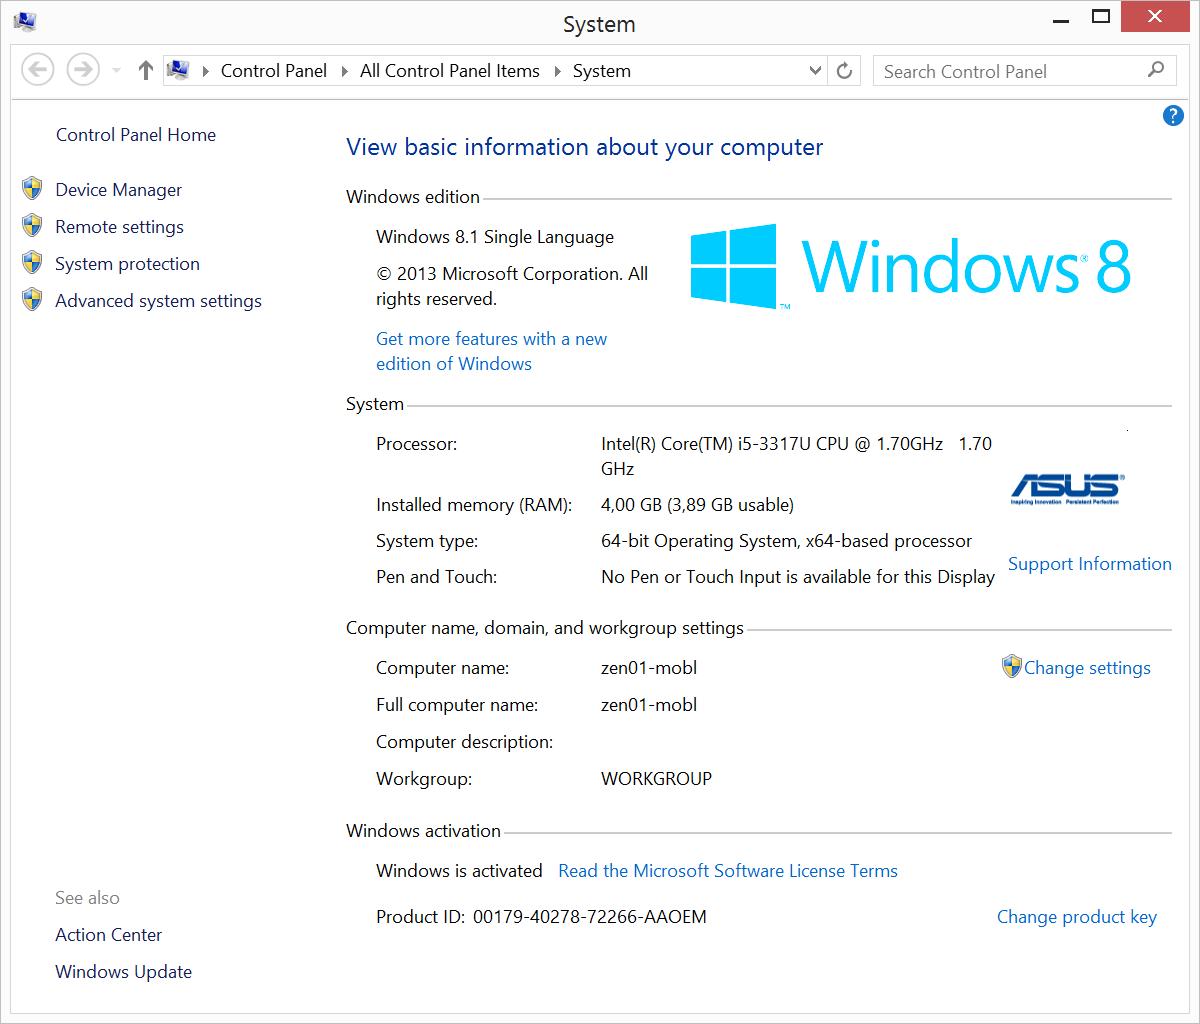 Обновление с Windows 7-8.1 до Windows 10 TP через Windows Update - 3